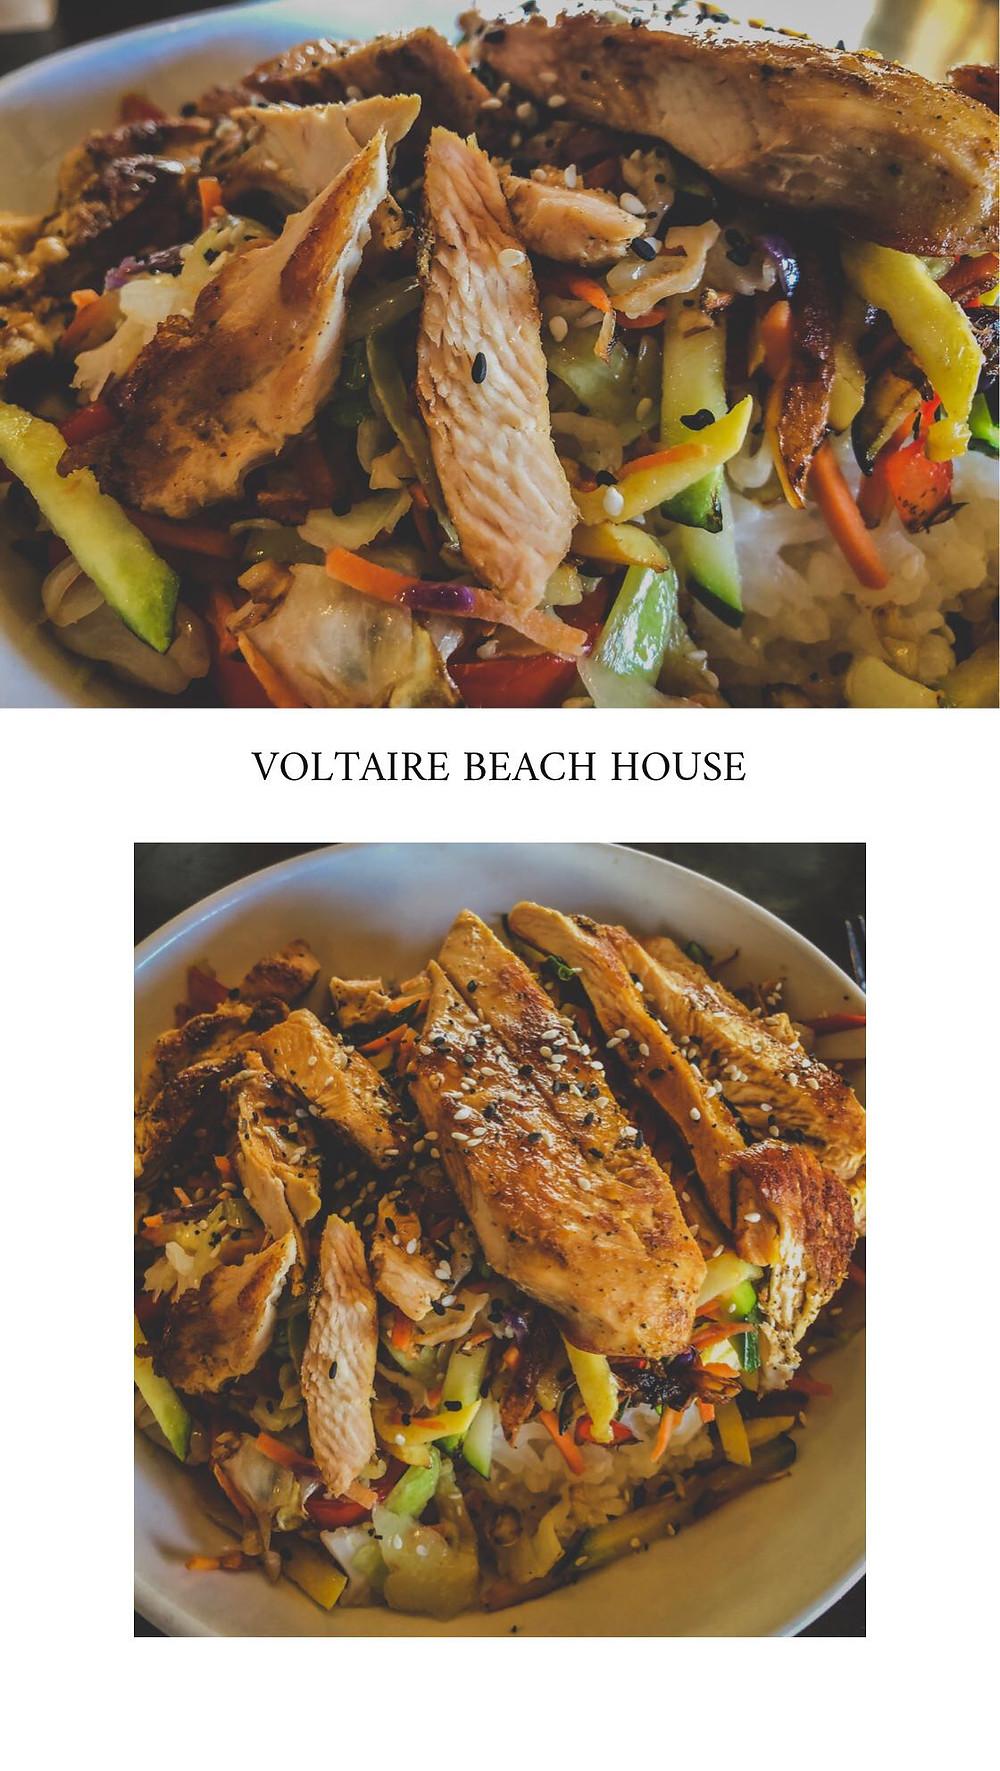 Voltaire Beach House